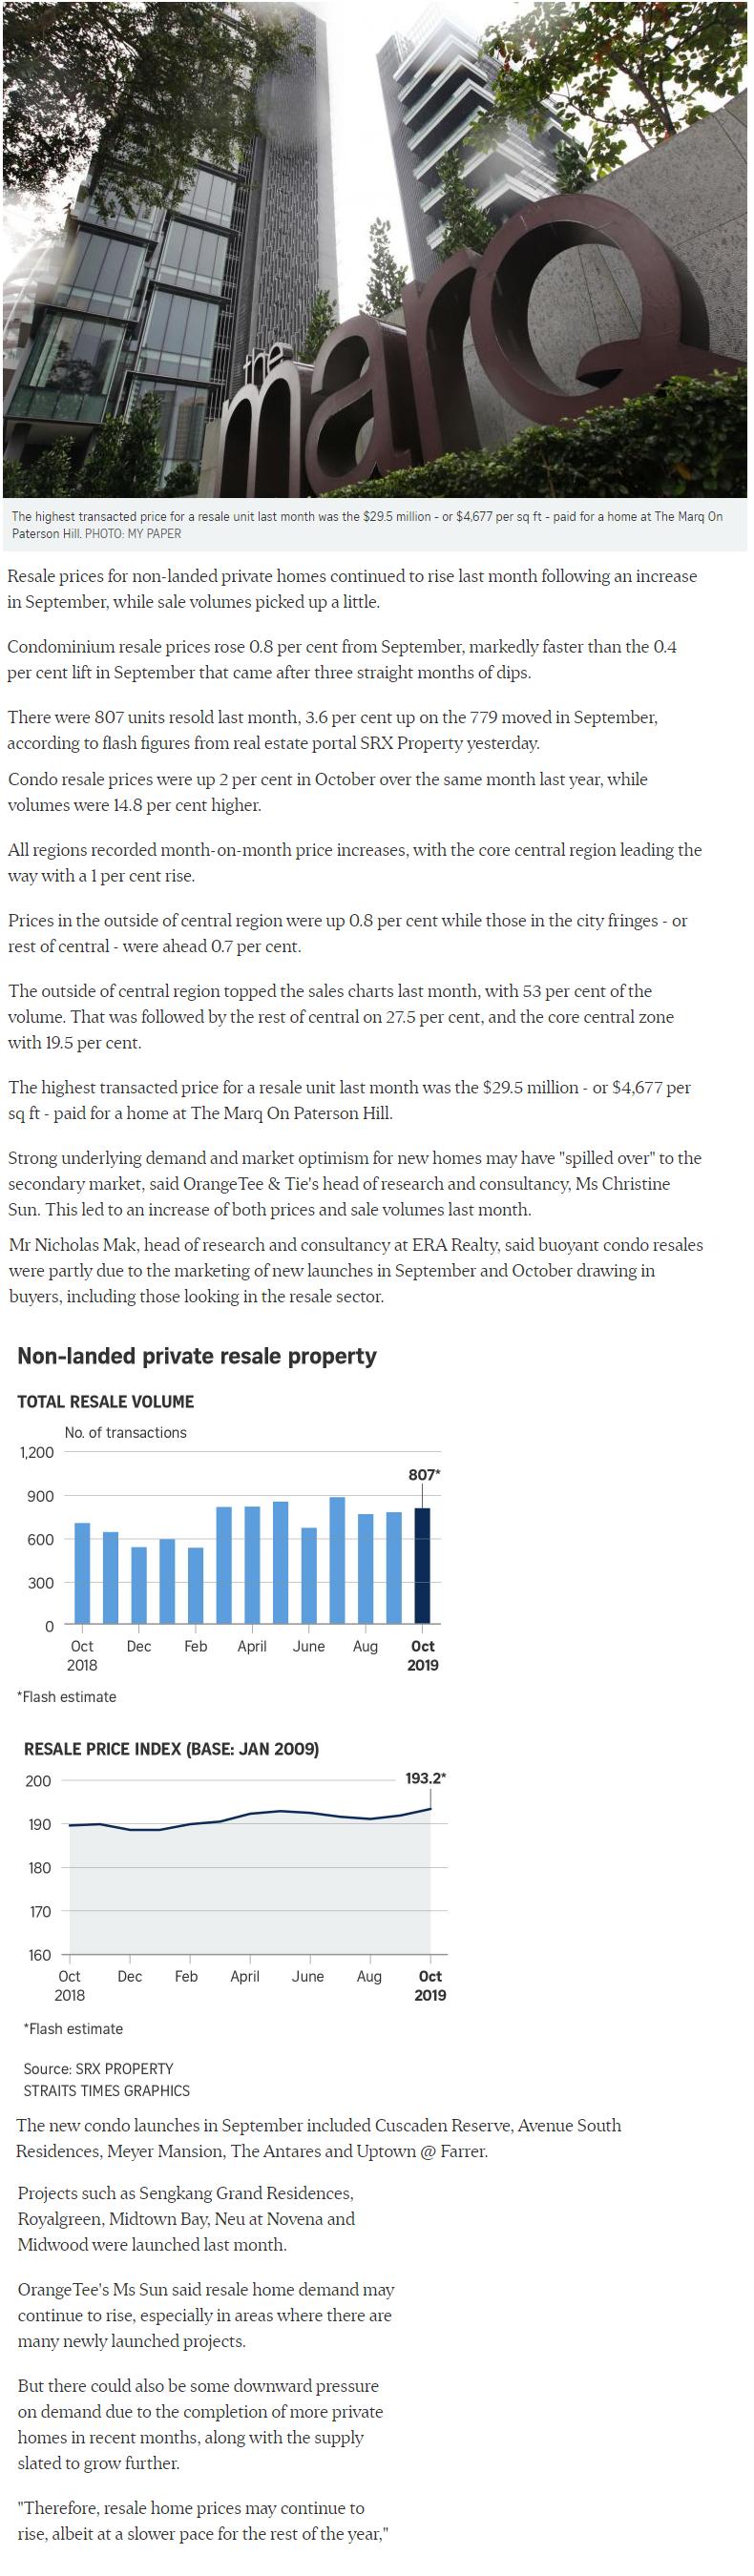 Myra - Singapore Condo Resale Prices Up 0.8% Last Month